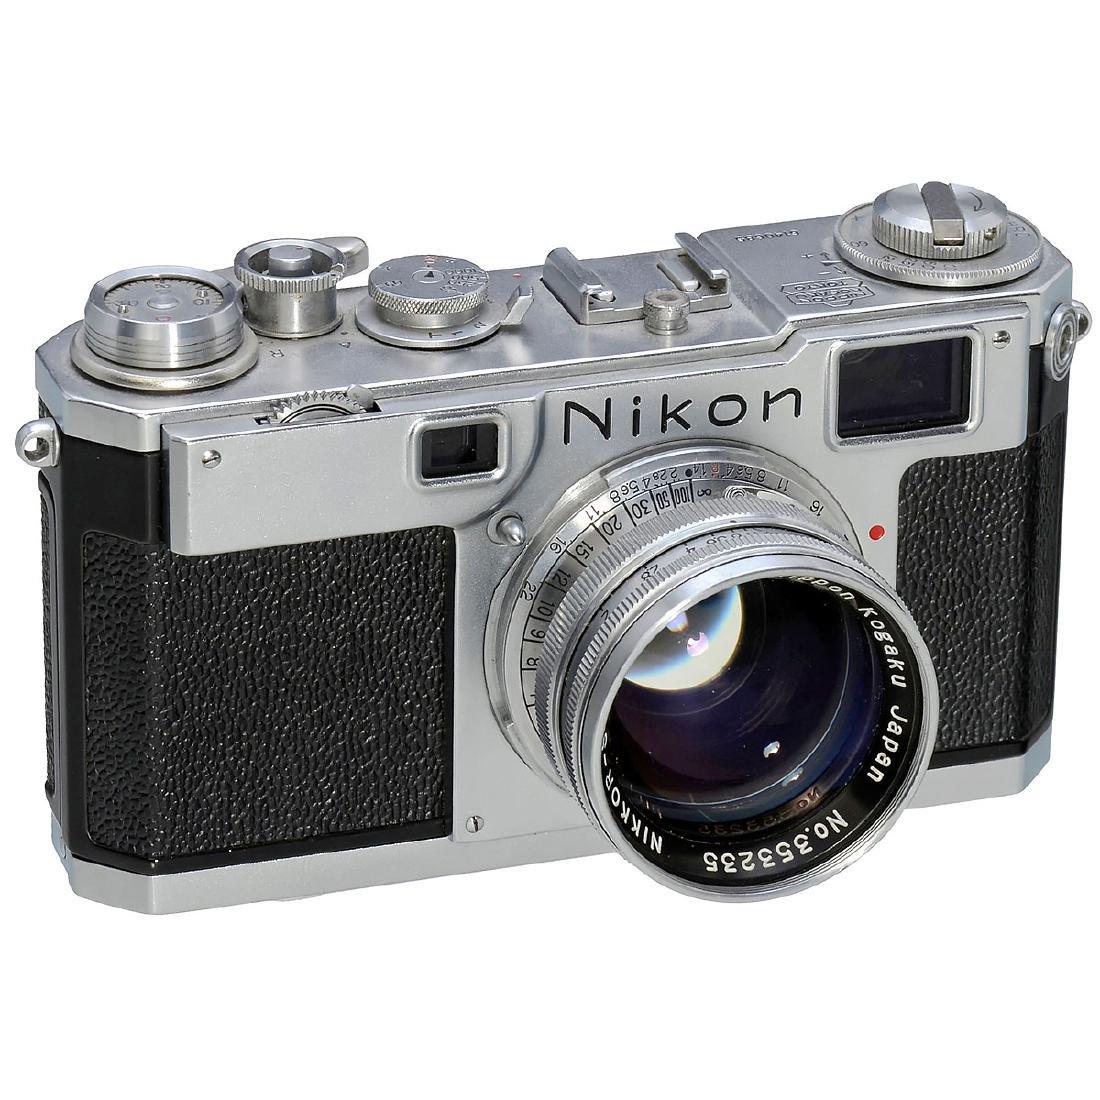 Nikon S2 with Nikkor-S.C 1,4/5 cm, 1954